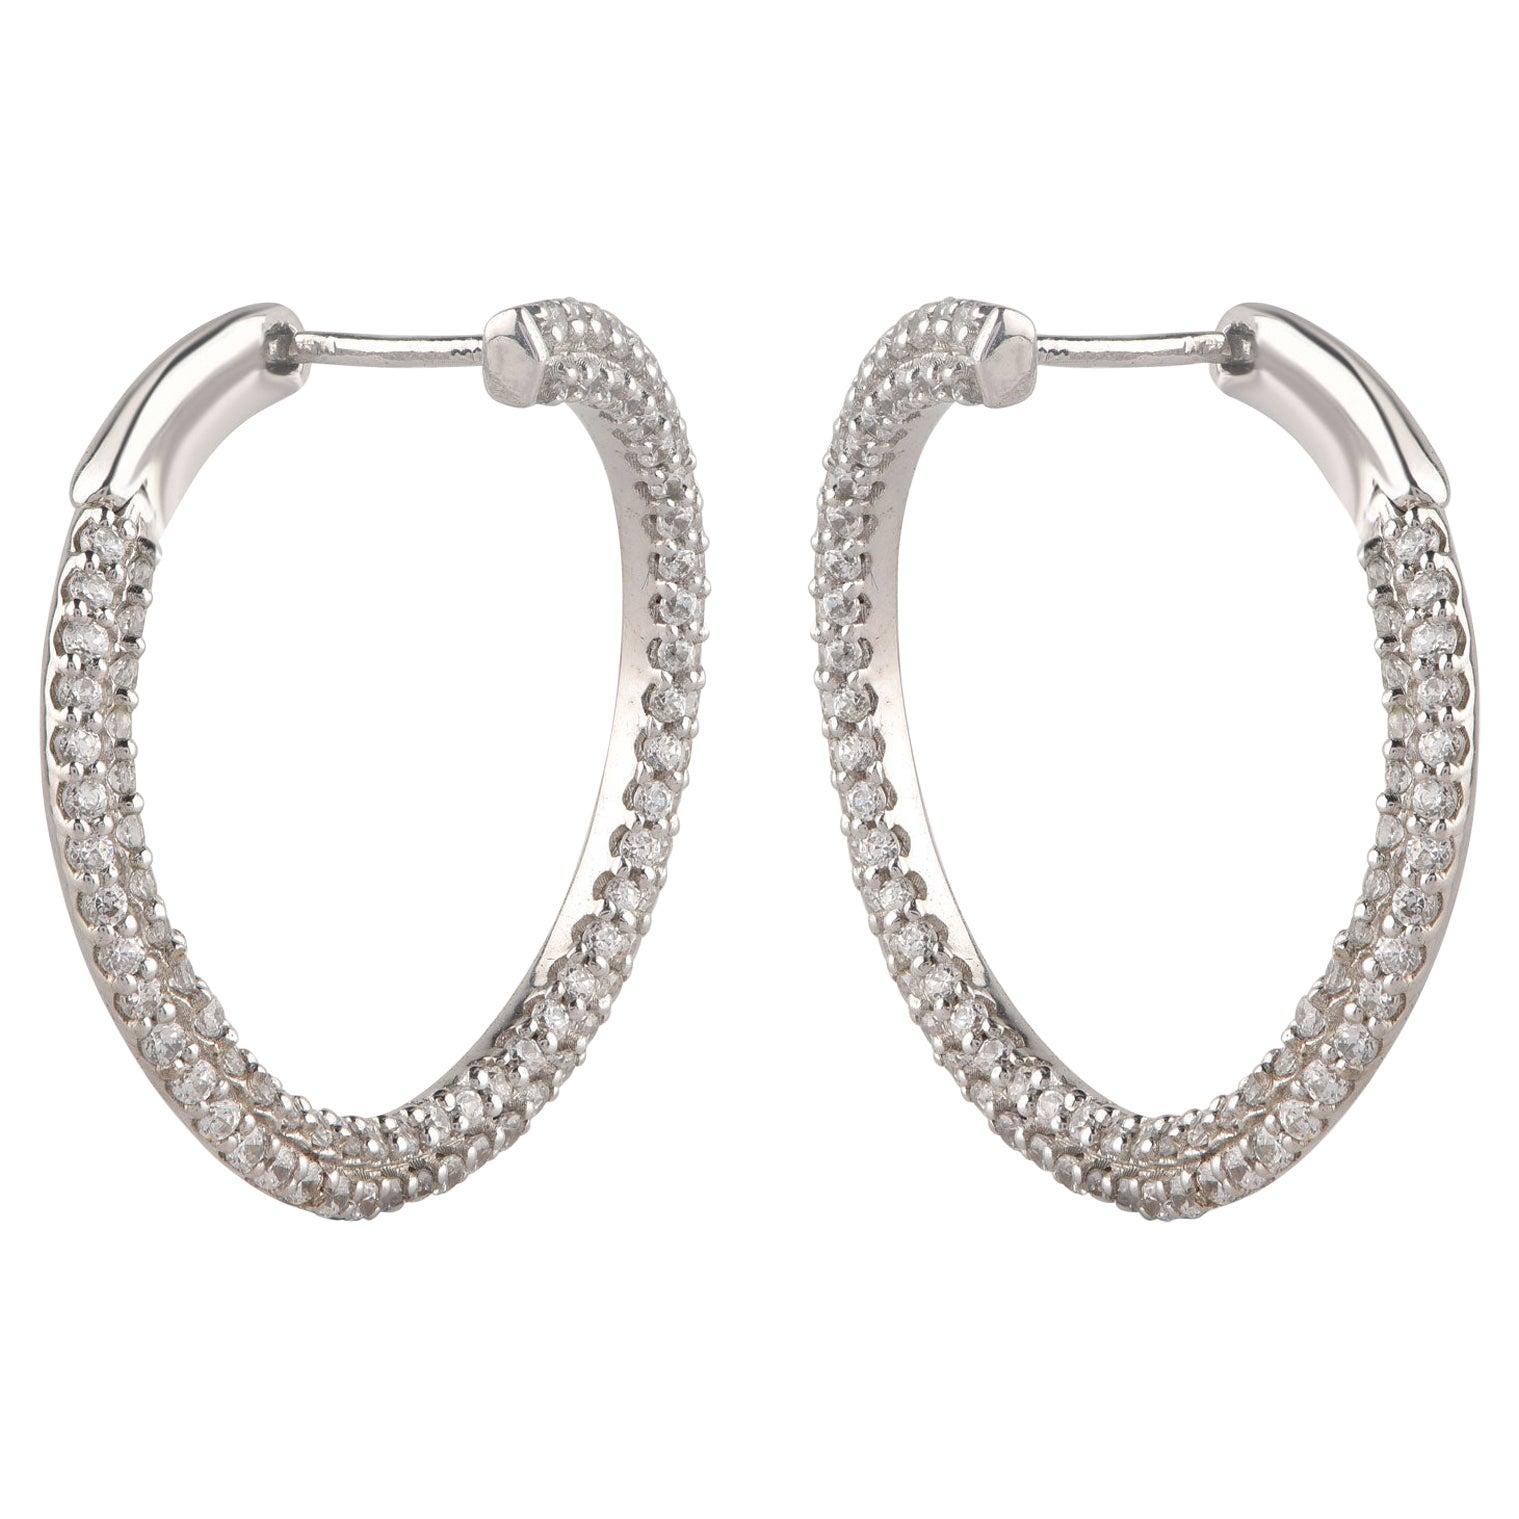 TJD 1.00 Carat Diamond 18 Karat White Gold Twist Charming Hoop Earrings